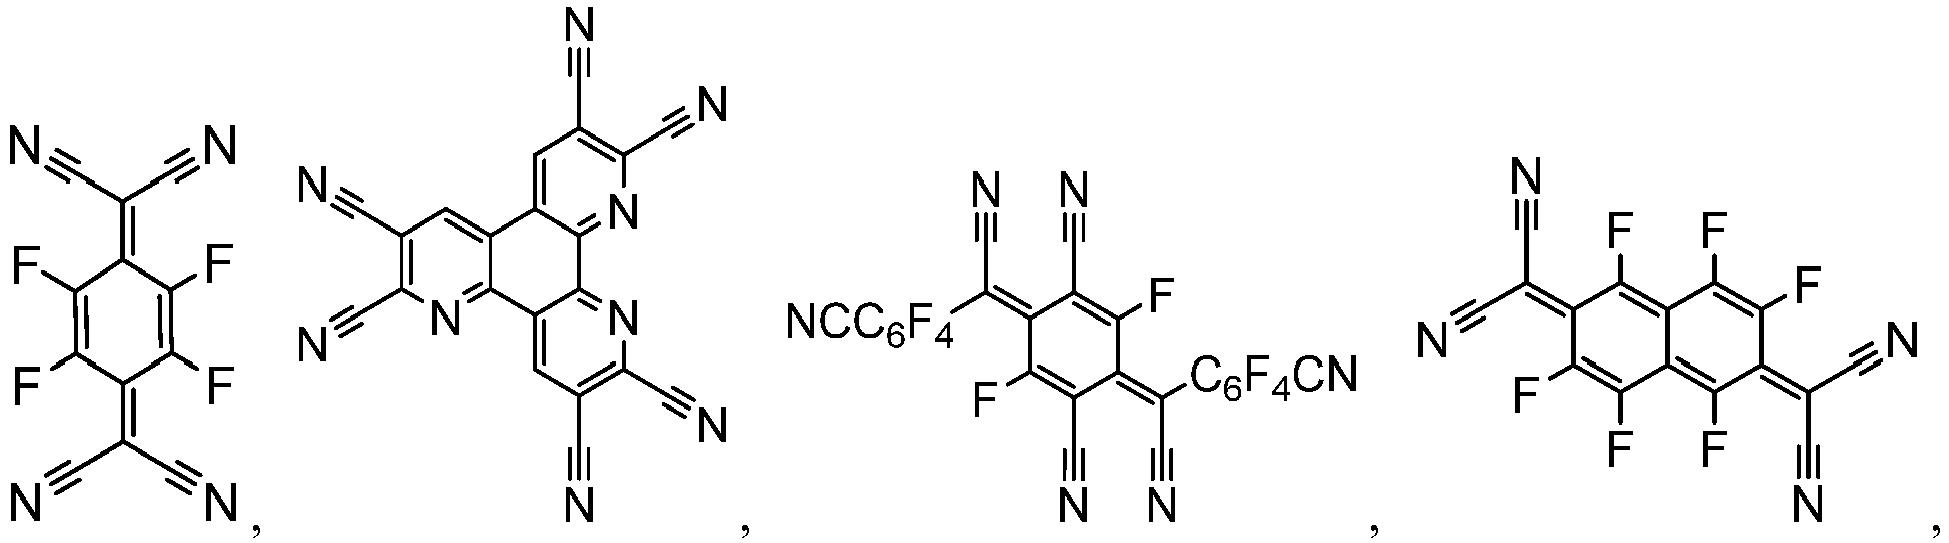 Figure imgb0832